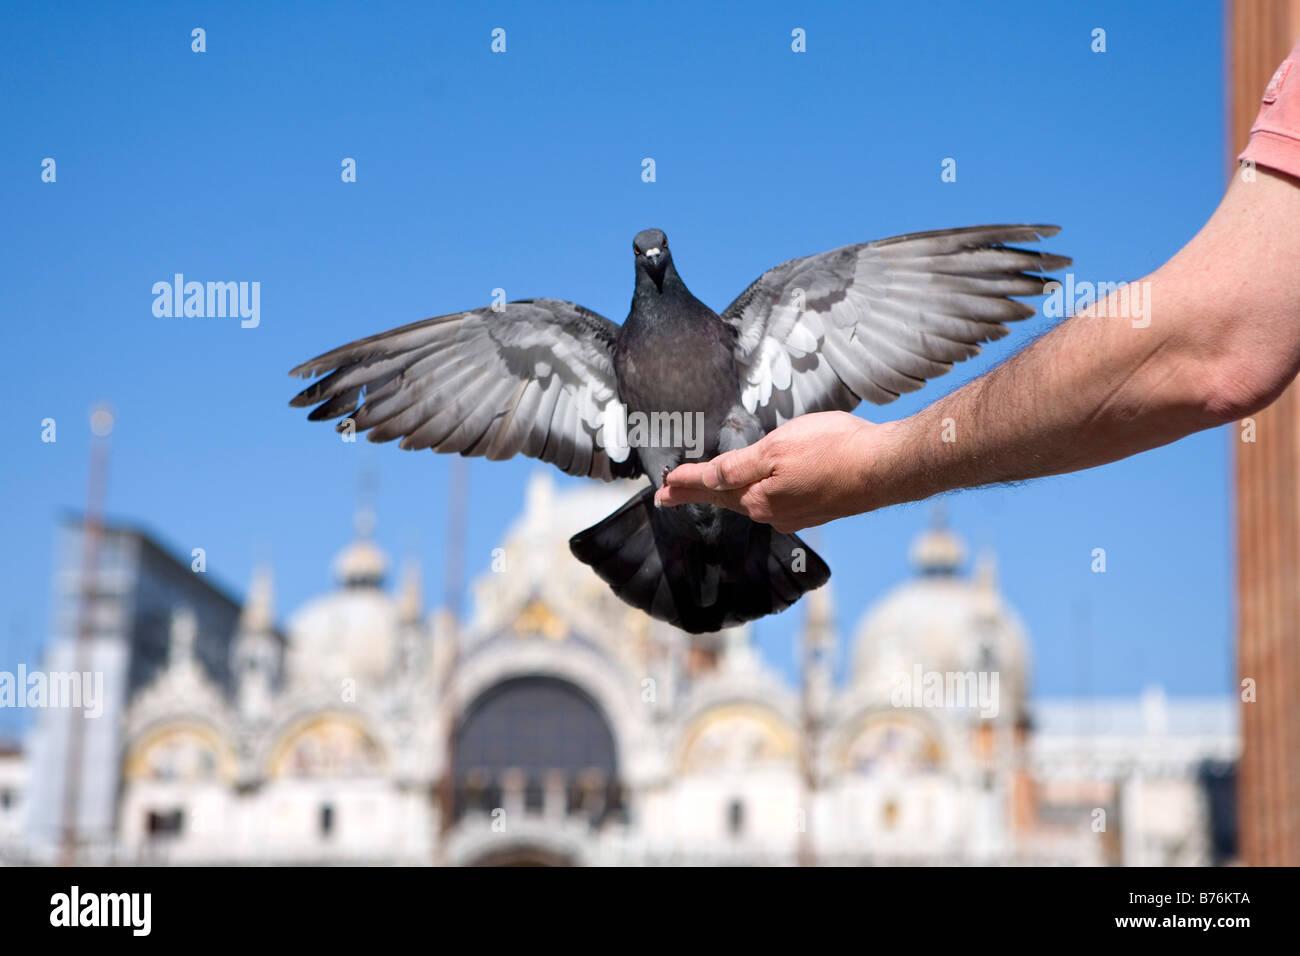 Pigeon, Piazza San Marco, Venezia, Veneto, Italia Immagini Stock